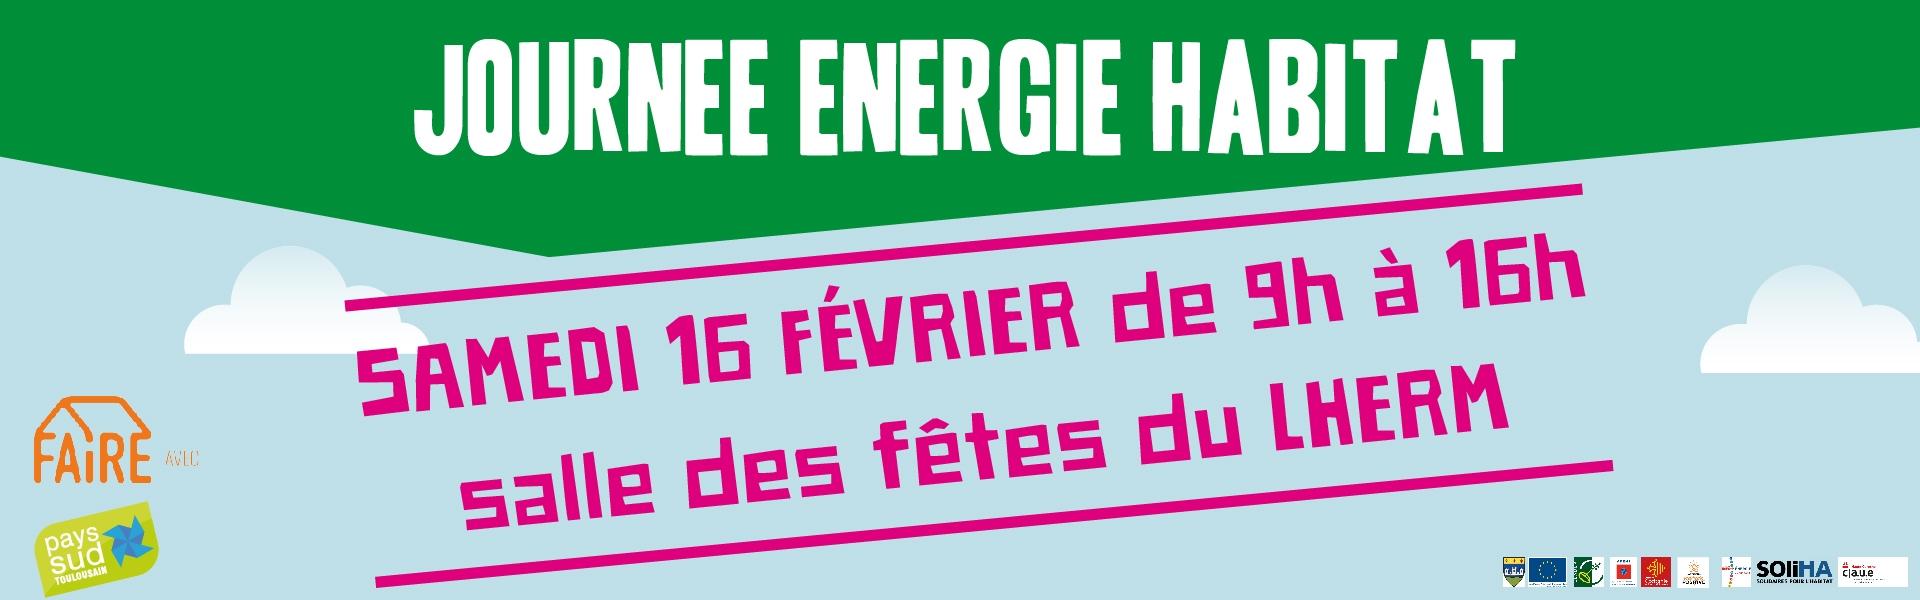 Journée énergie au Lherm